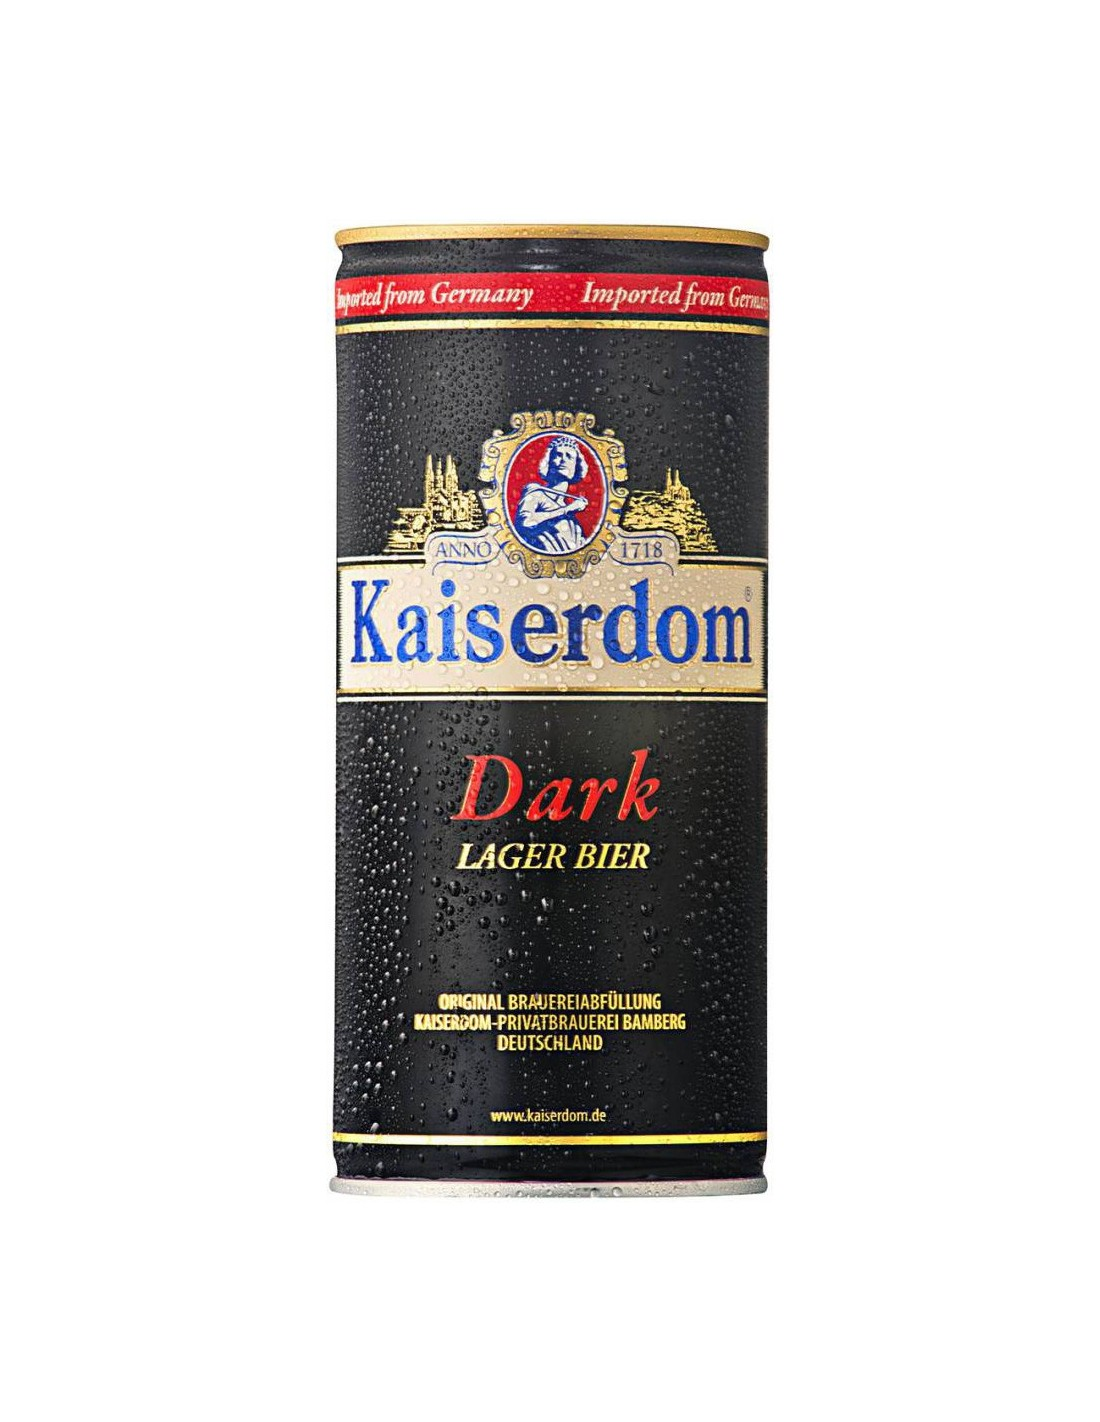 Bere neagra, Kaiserdom, 4.8% alc., 1L, Germania